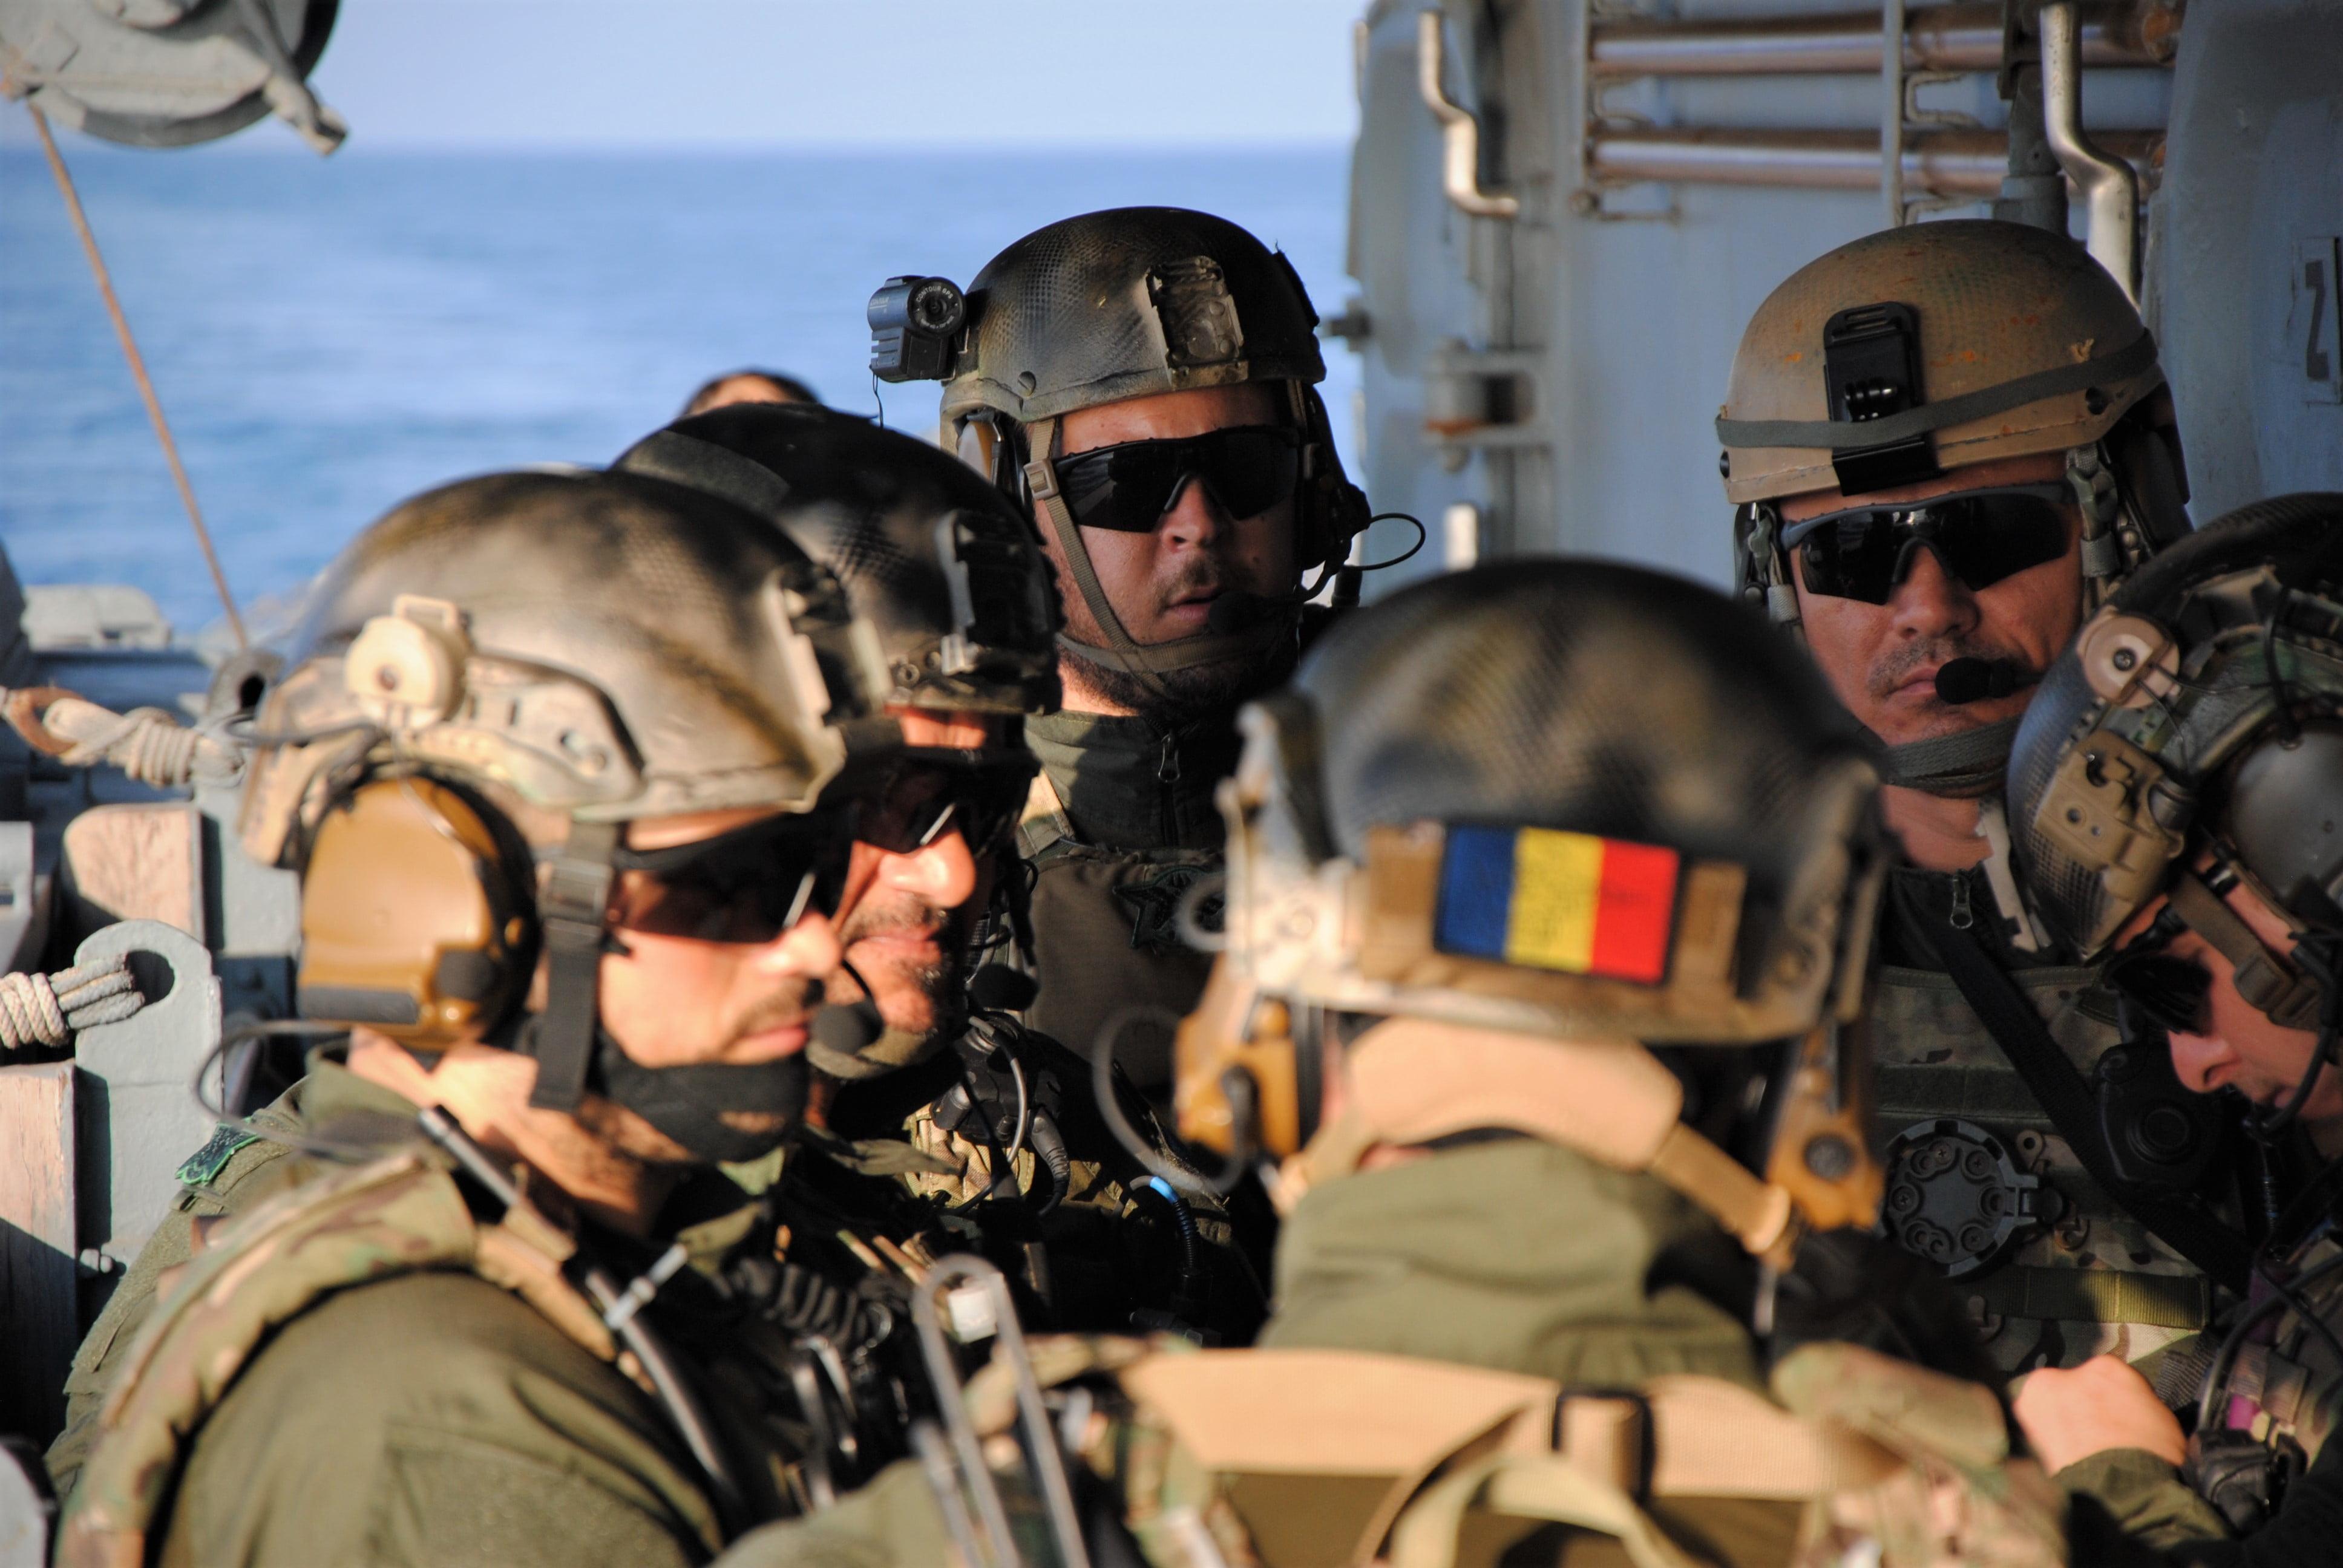 fregata ferdinand armata naval 3